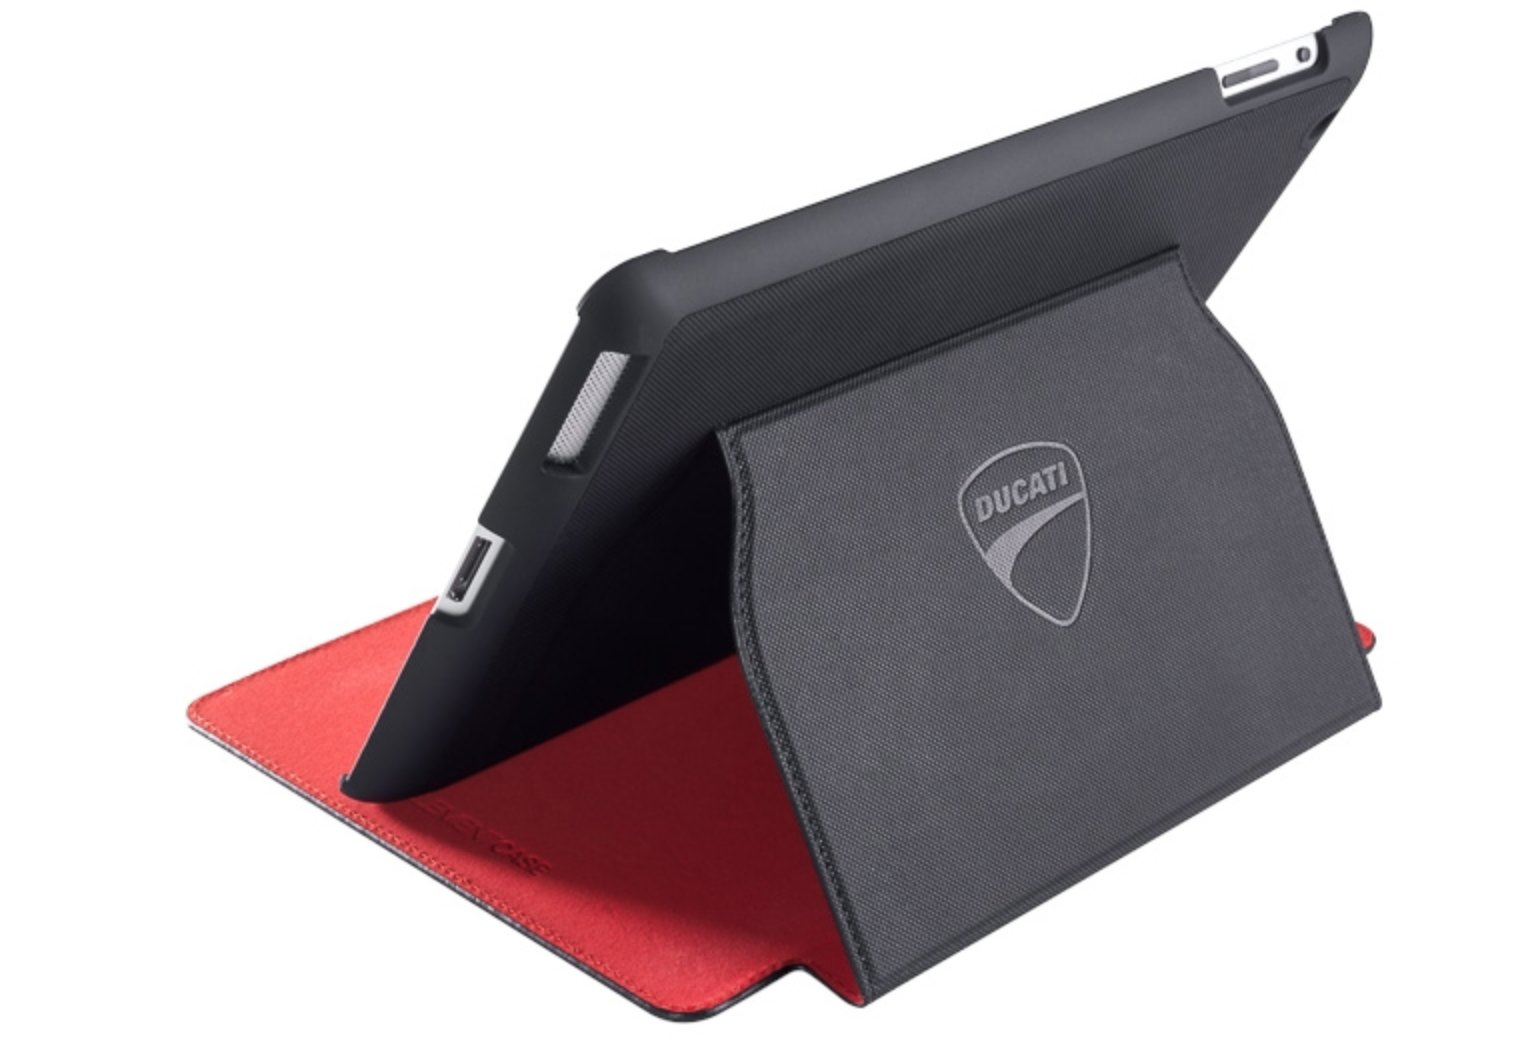 Soft-Tec Ducati Folio for Apple iPad – Review